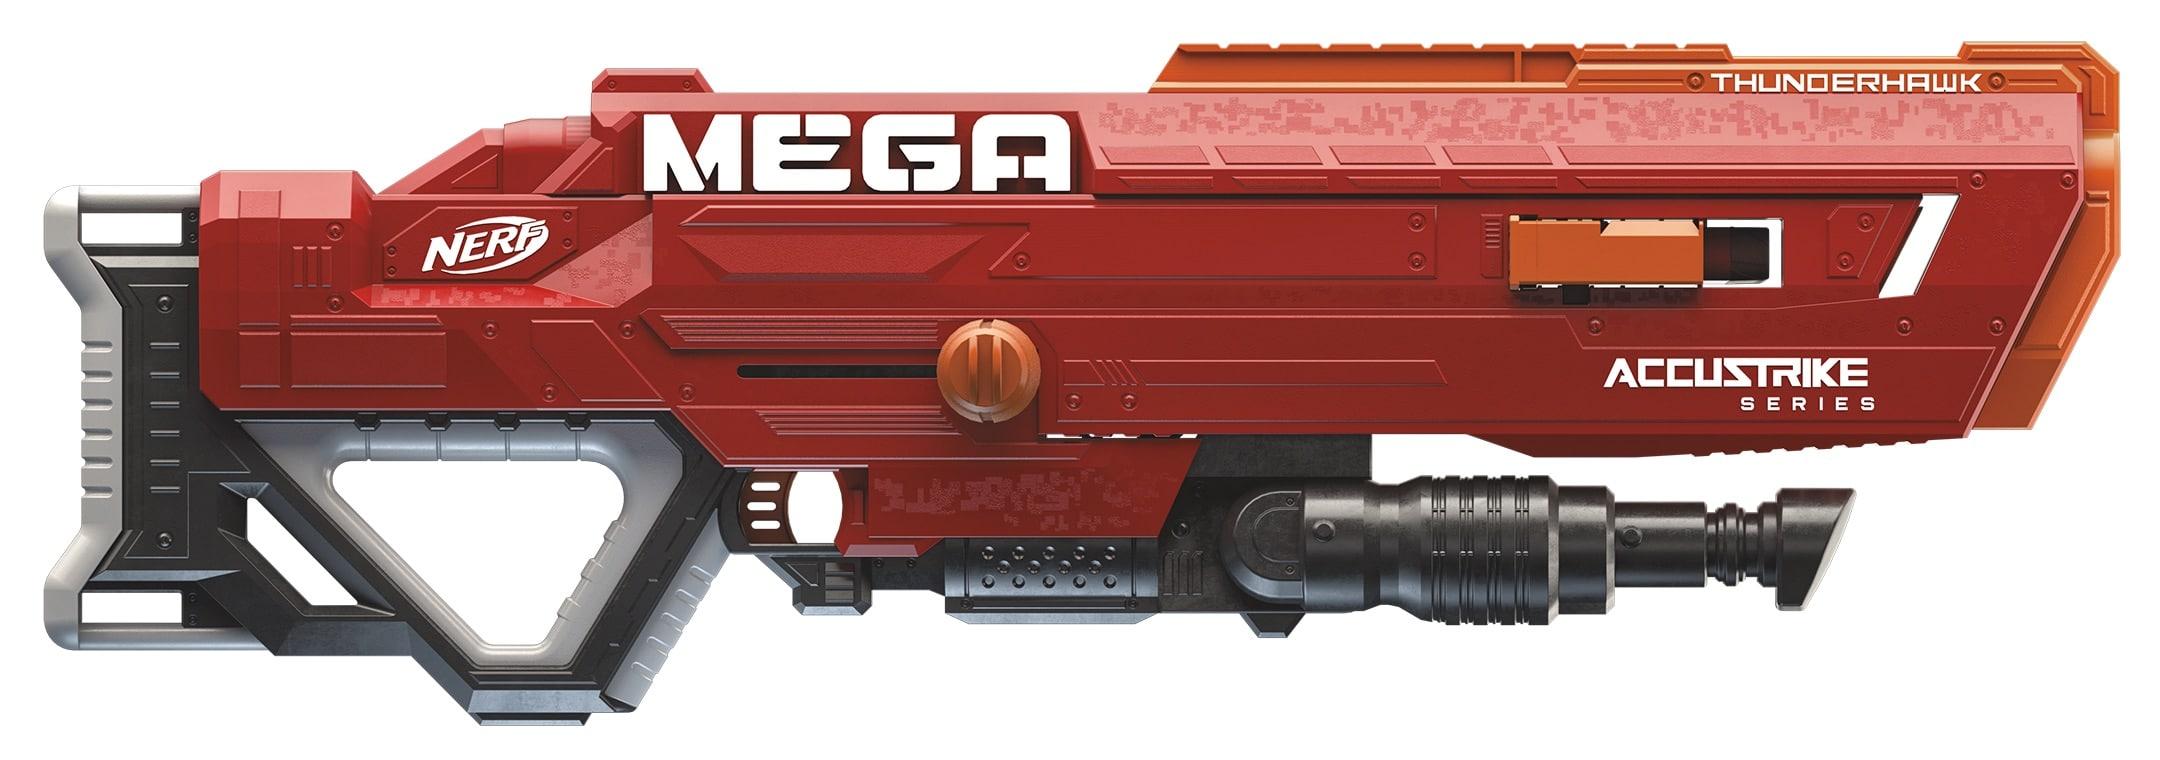 Nerf Accustrike Mega Thunderhawk